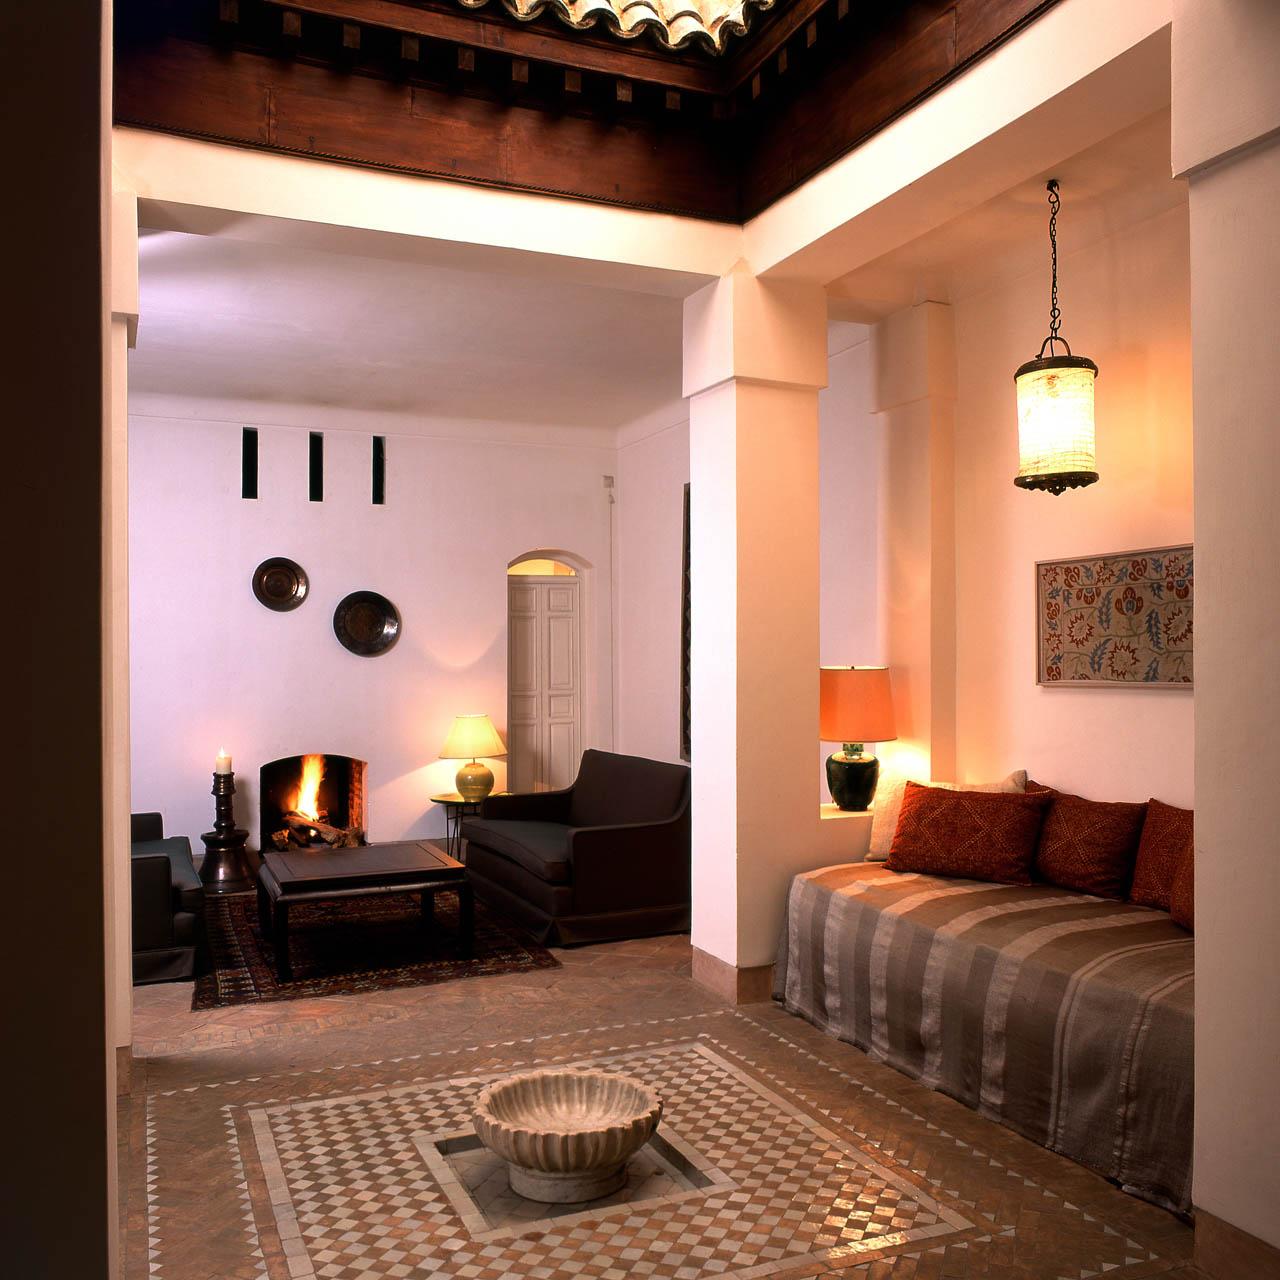 Suite ottomane riyad el cadi for Salon avec cheminee